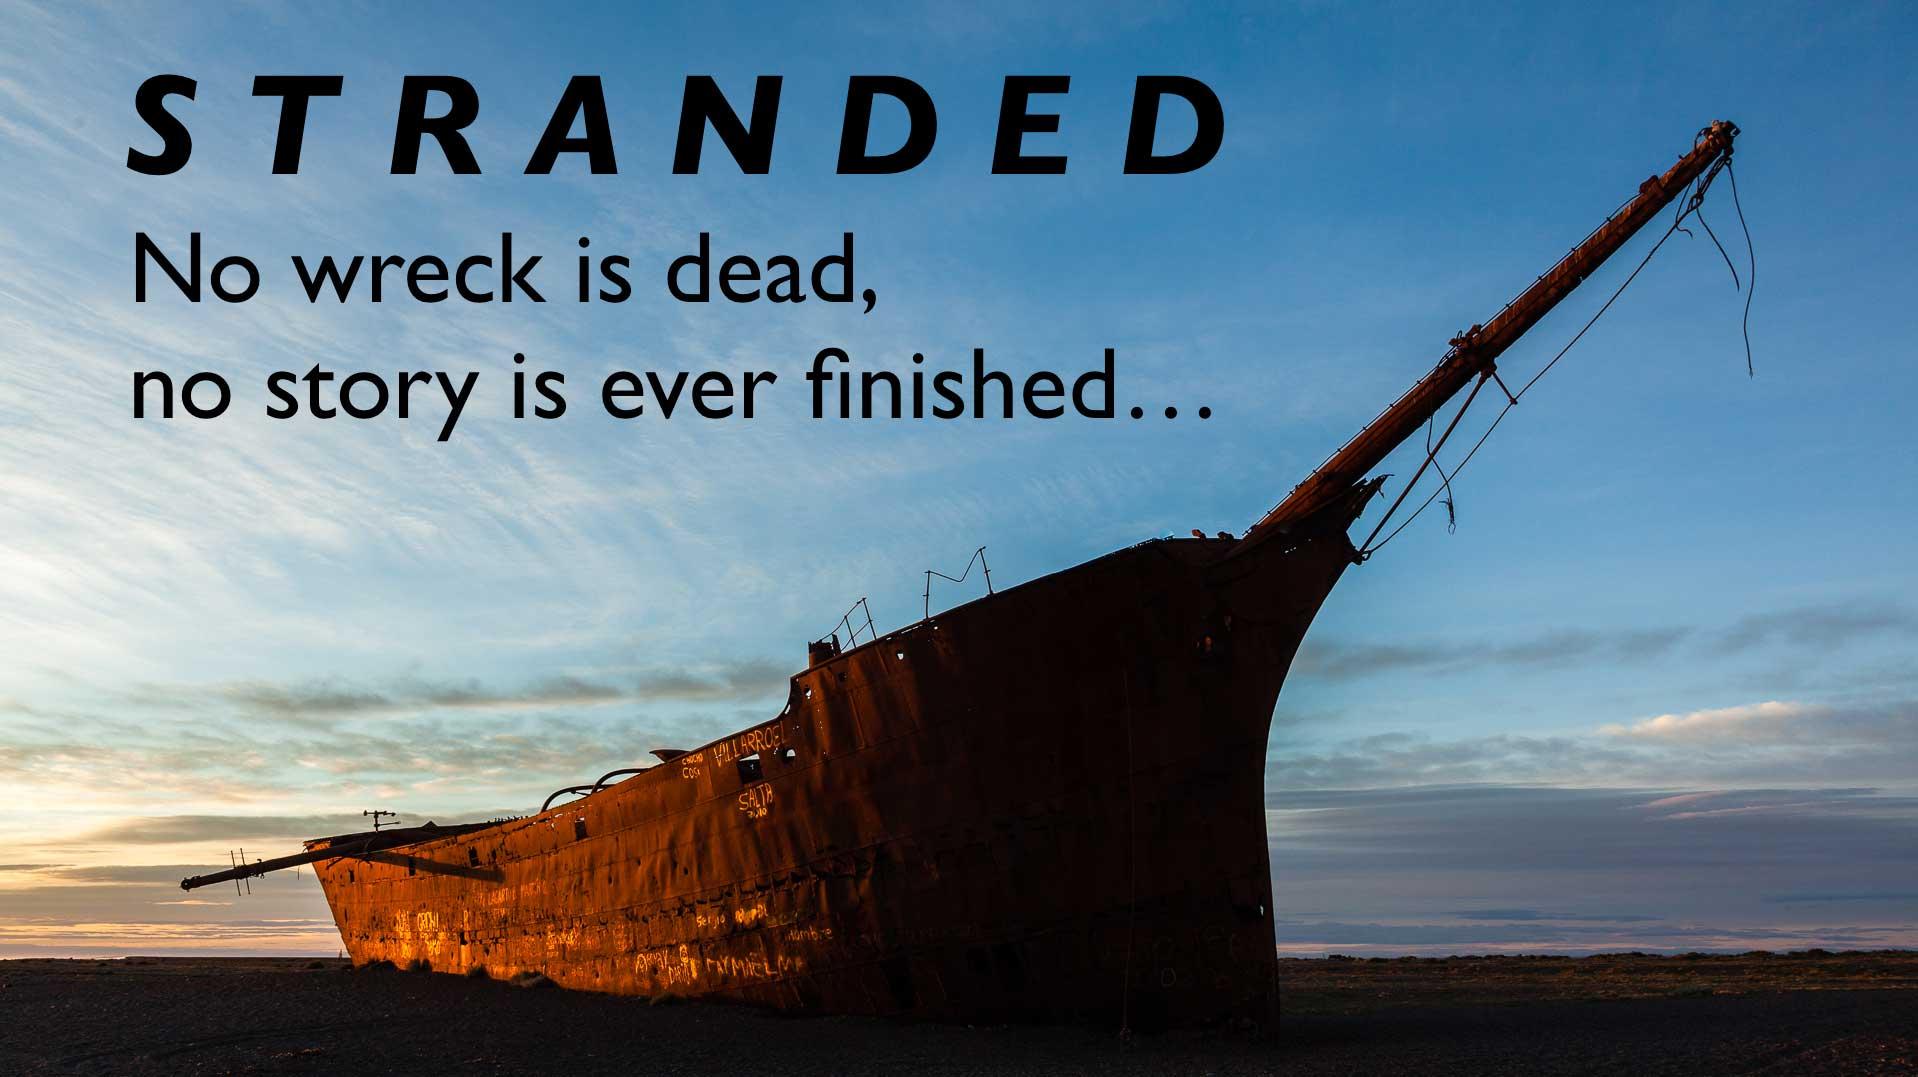 Stranded_16-9